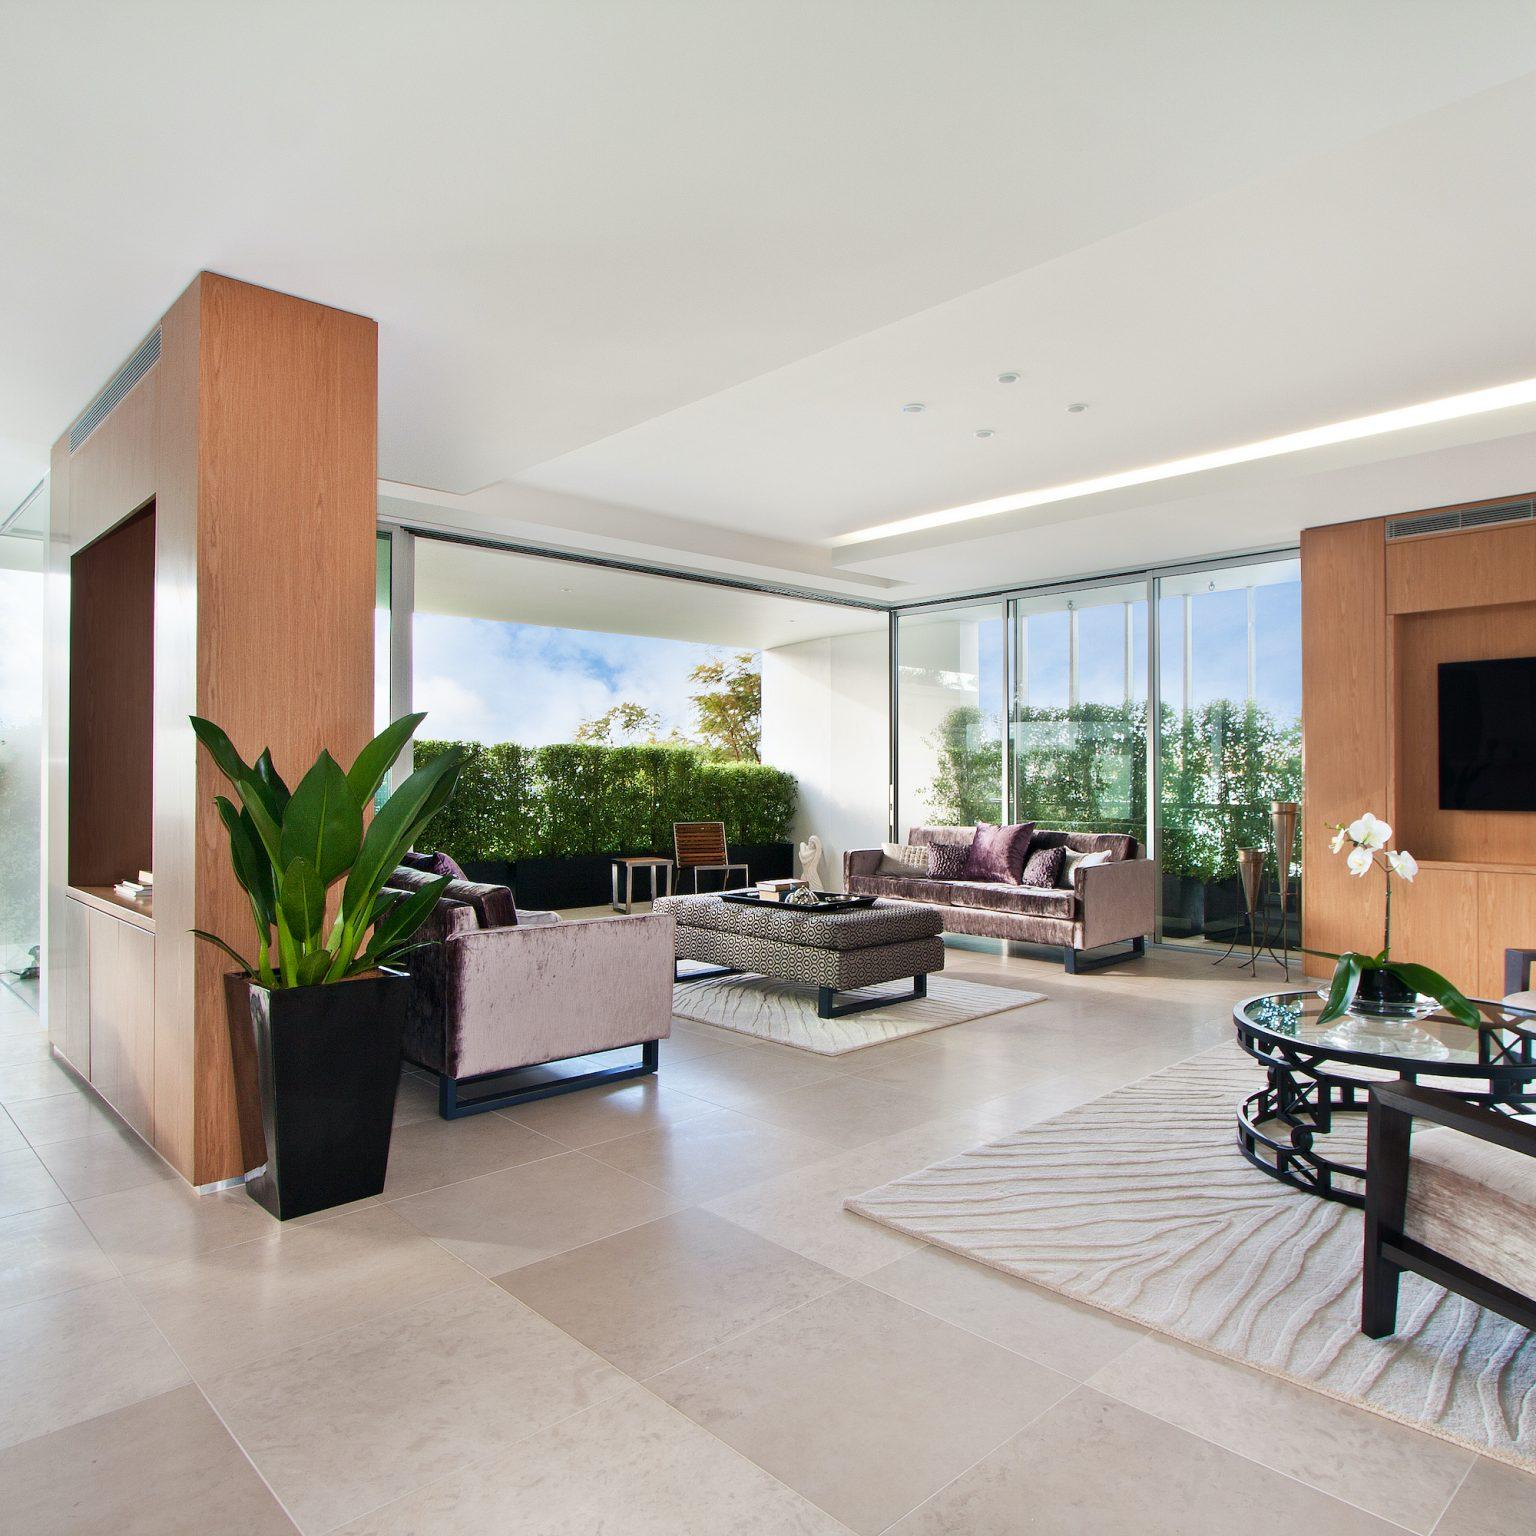 aluminium sliding doors in a new home